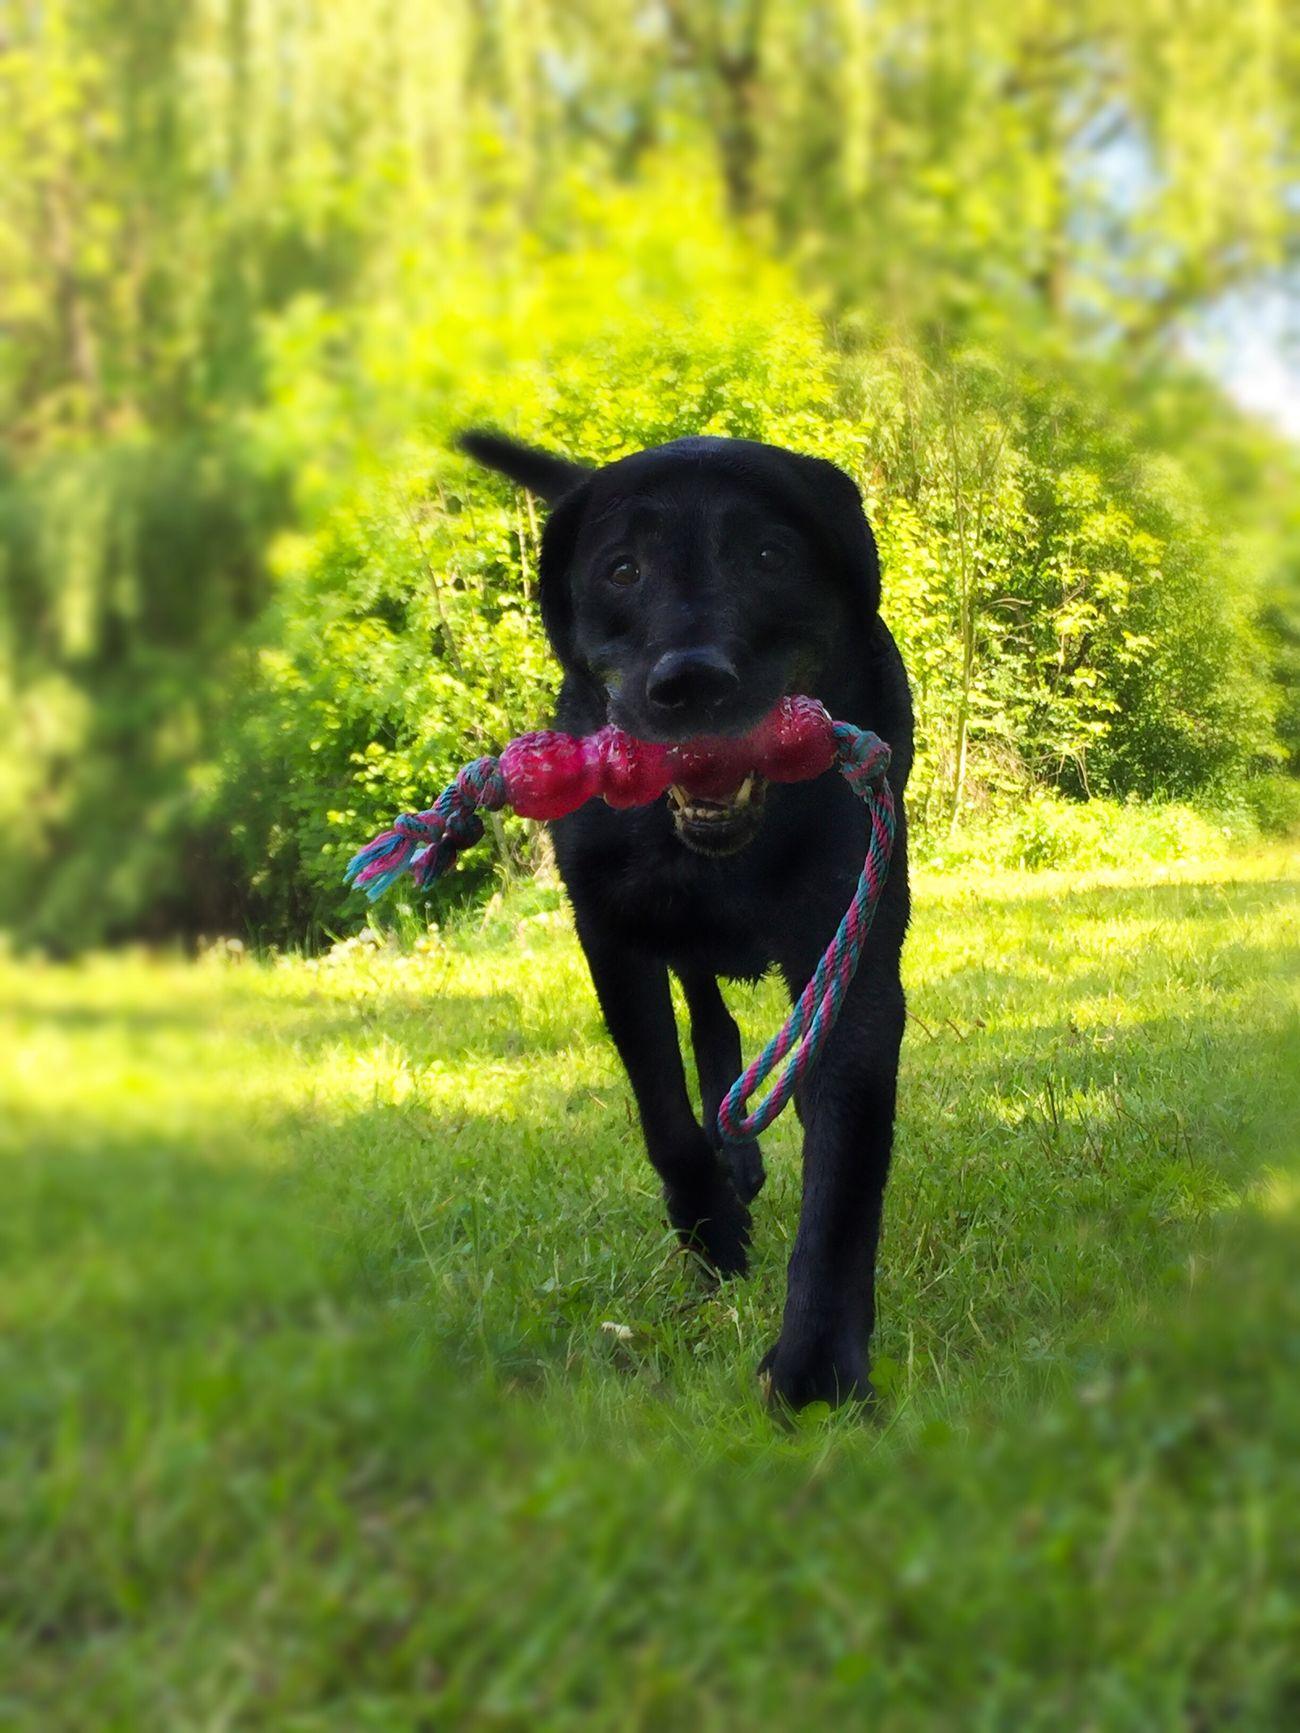 Dog Animal Themes Black Color One Animal Pets Green Color Outdoors Nature No People Black Labrador Lovethisdog Sunset